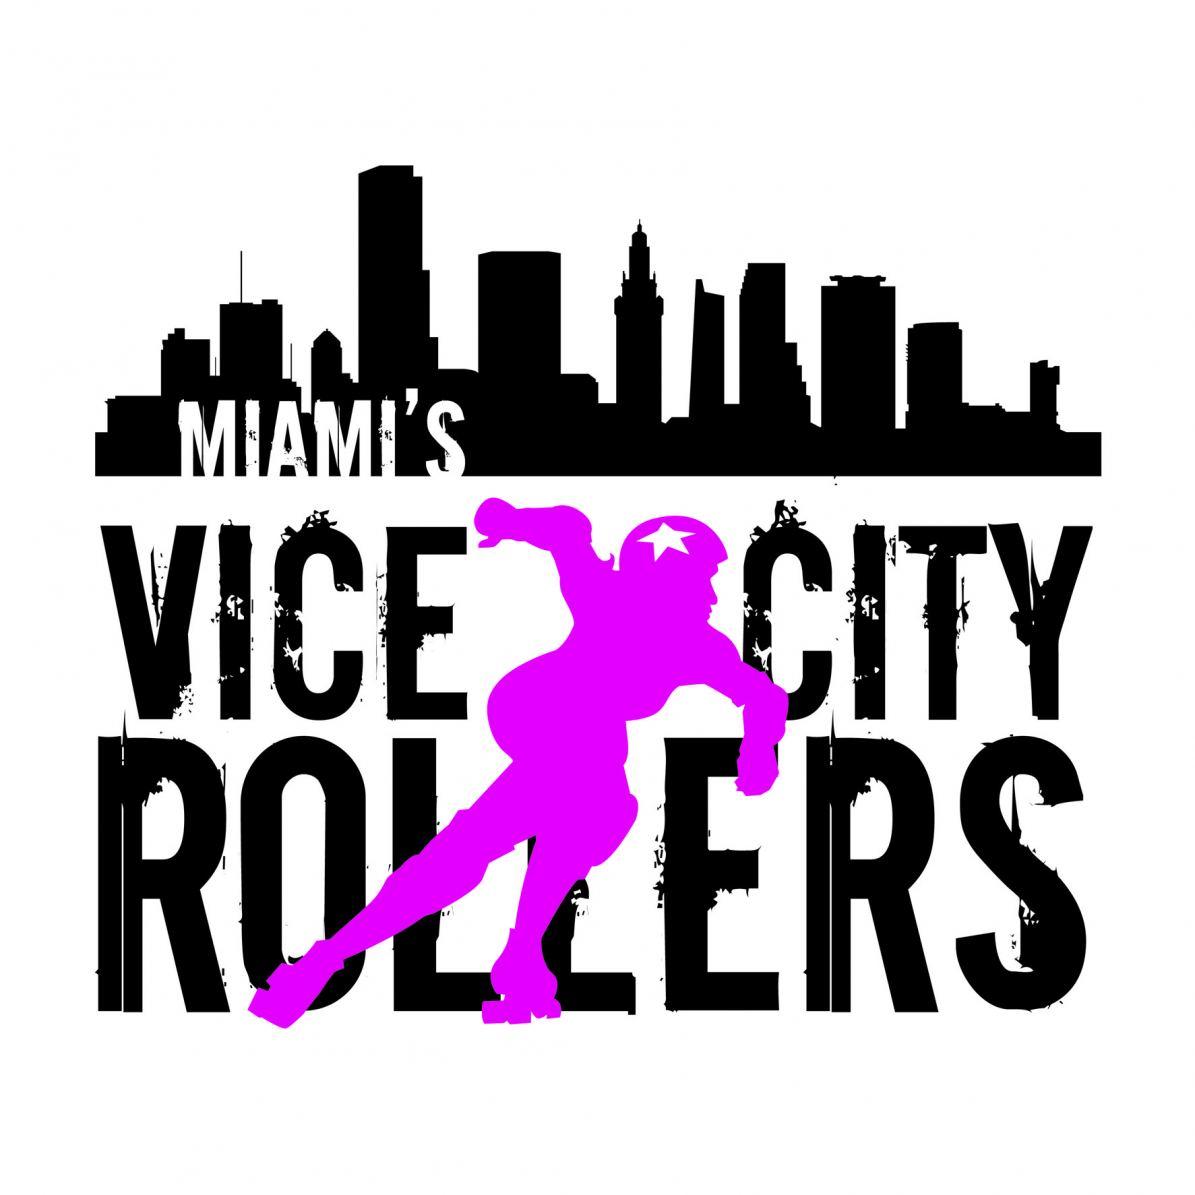 Miami Roller Derby Logo